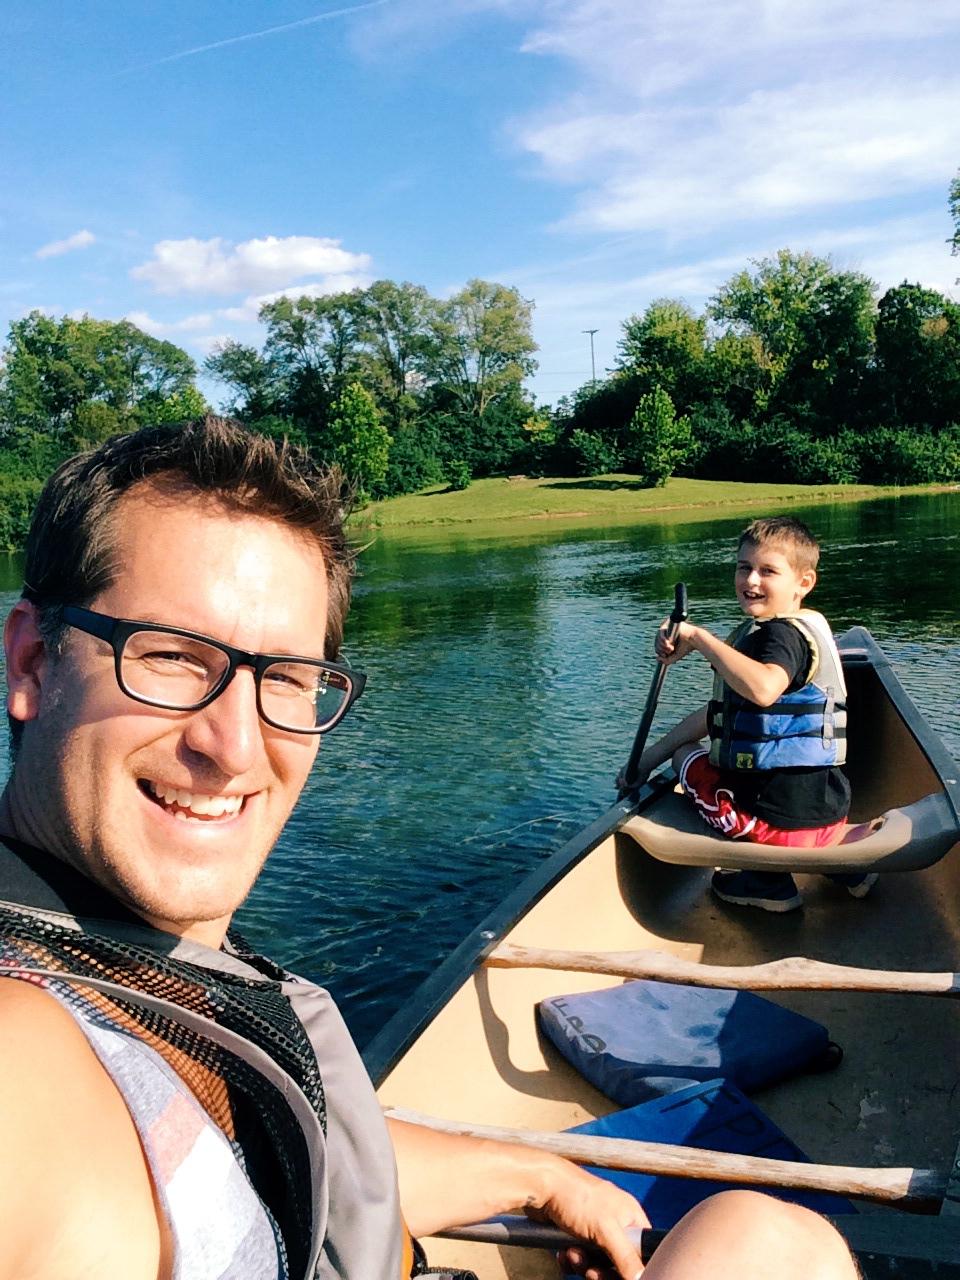 We were working on Eli's paddling skills